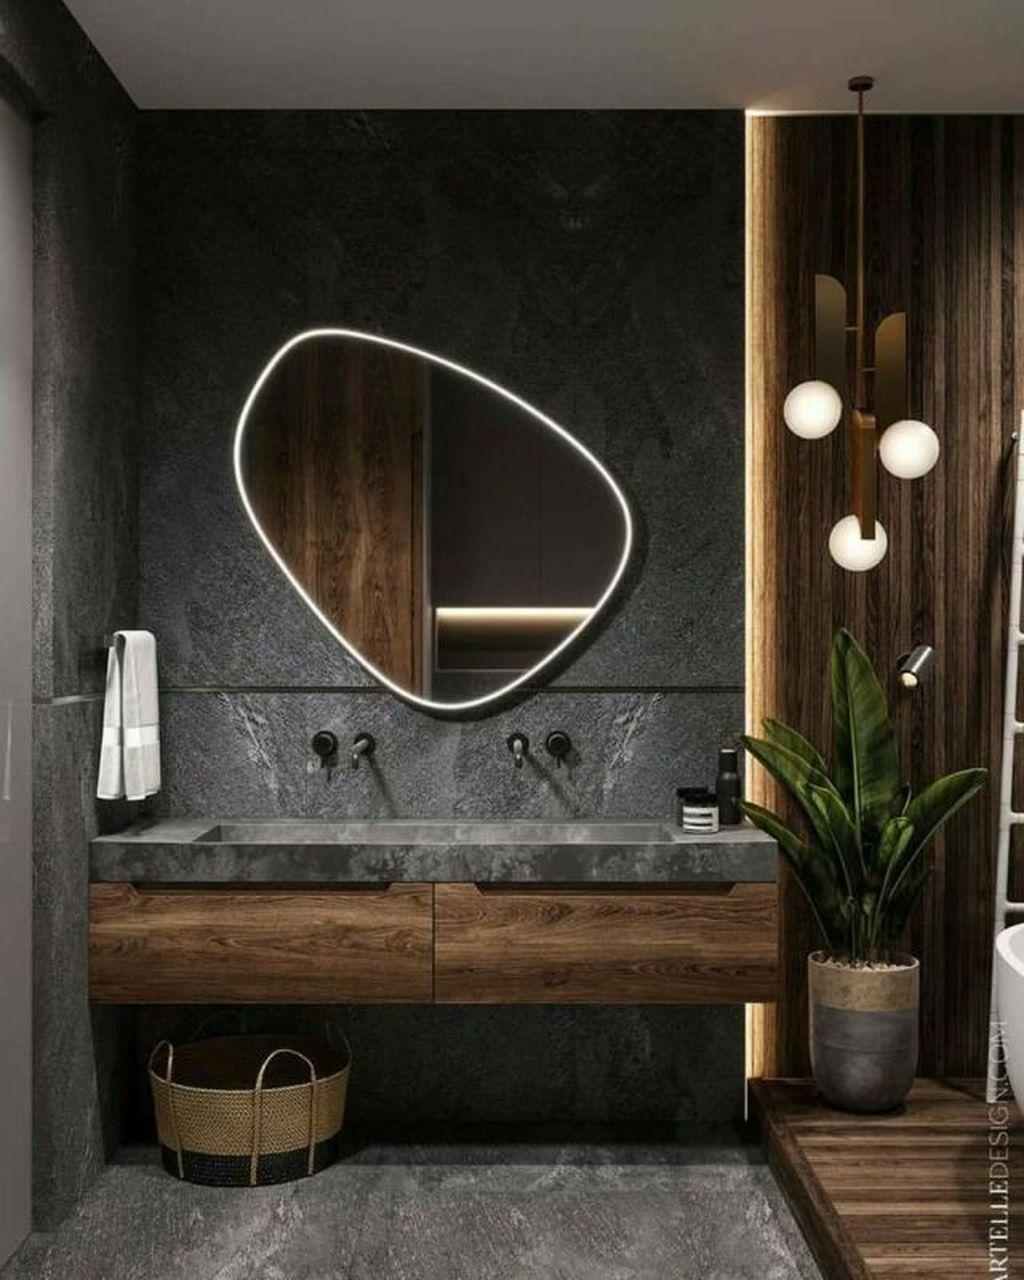 36 Stunning Nature Bathroom Design Ideas To Get Fresh Look Amazing Bathrooms Natural Bathroom Bathroom Design Luxury